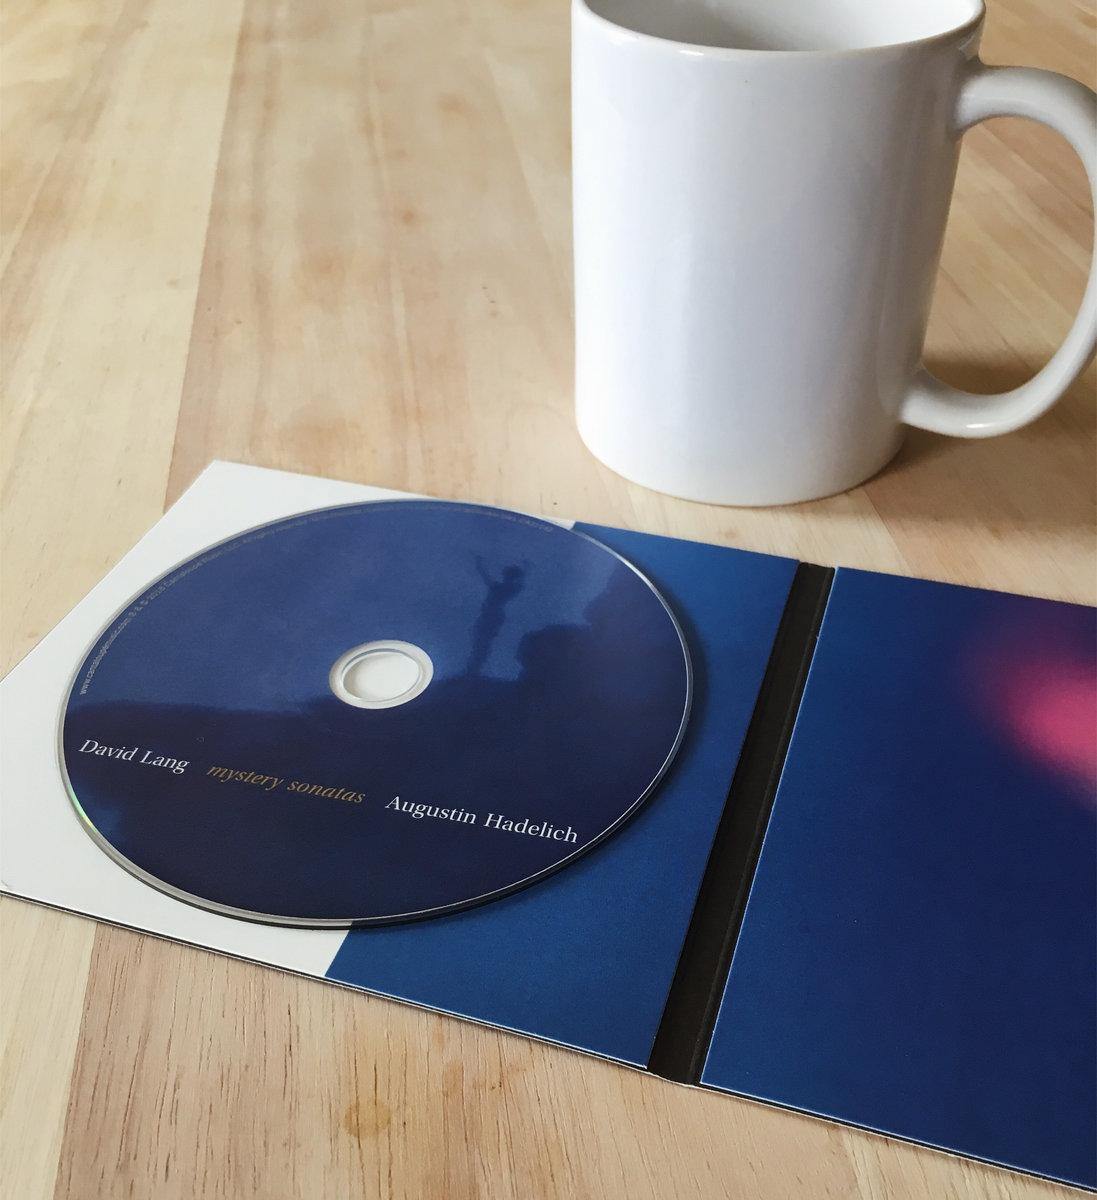 6-panel CD wallet